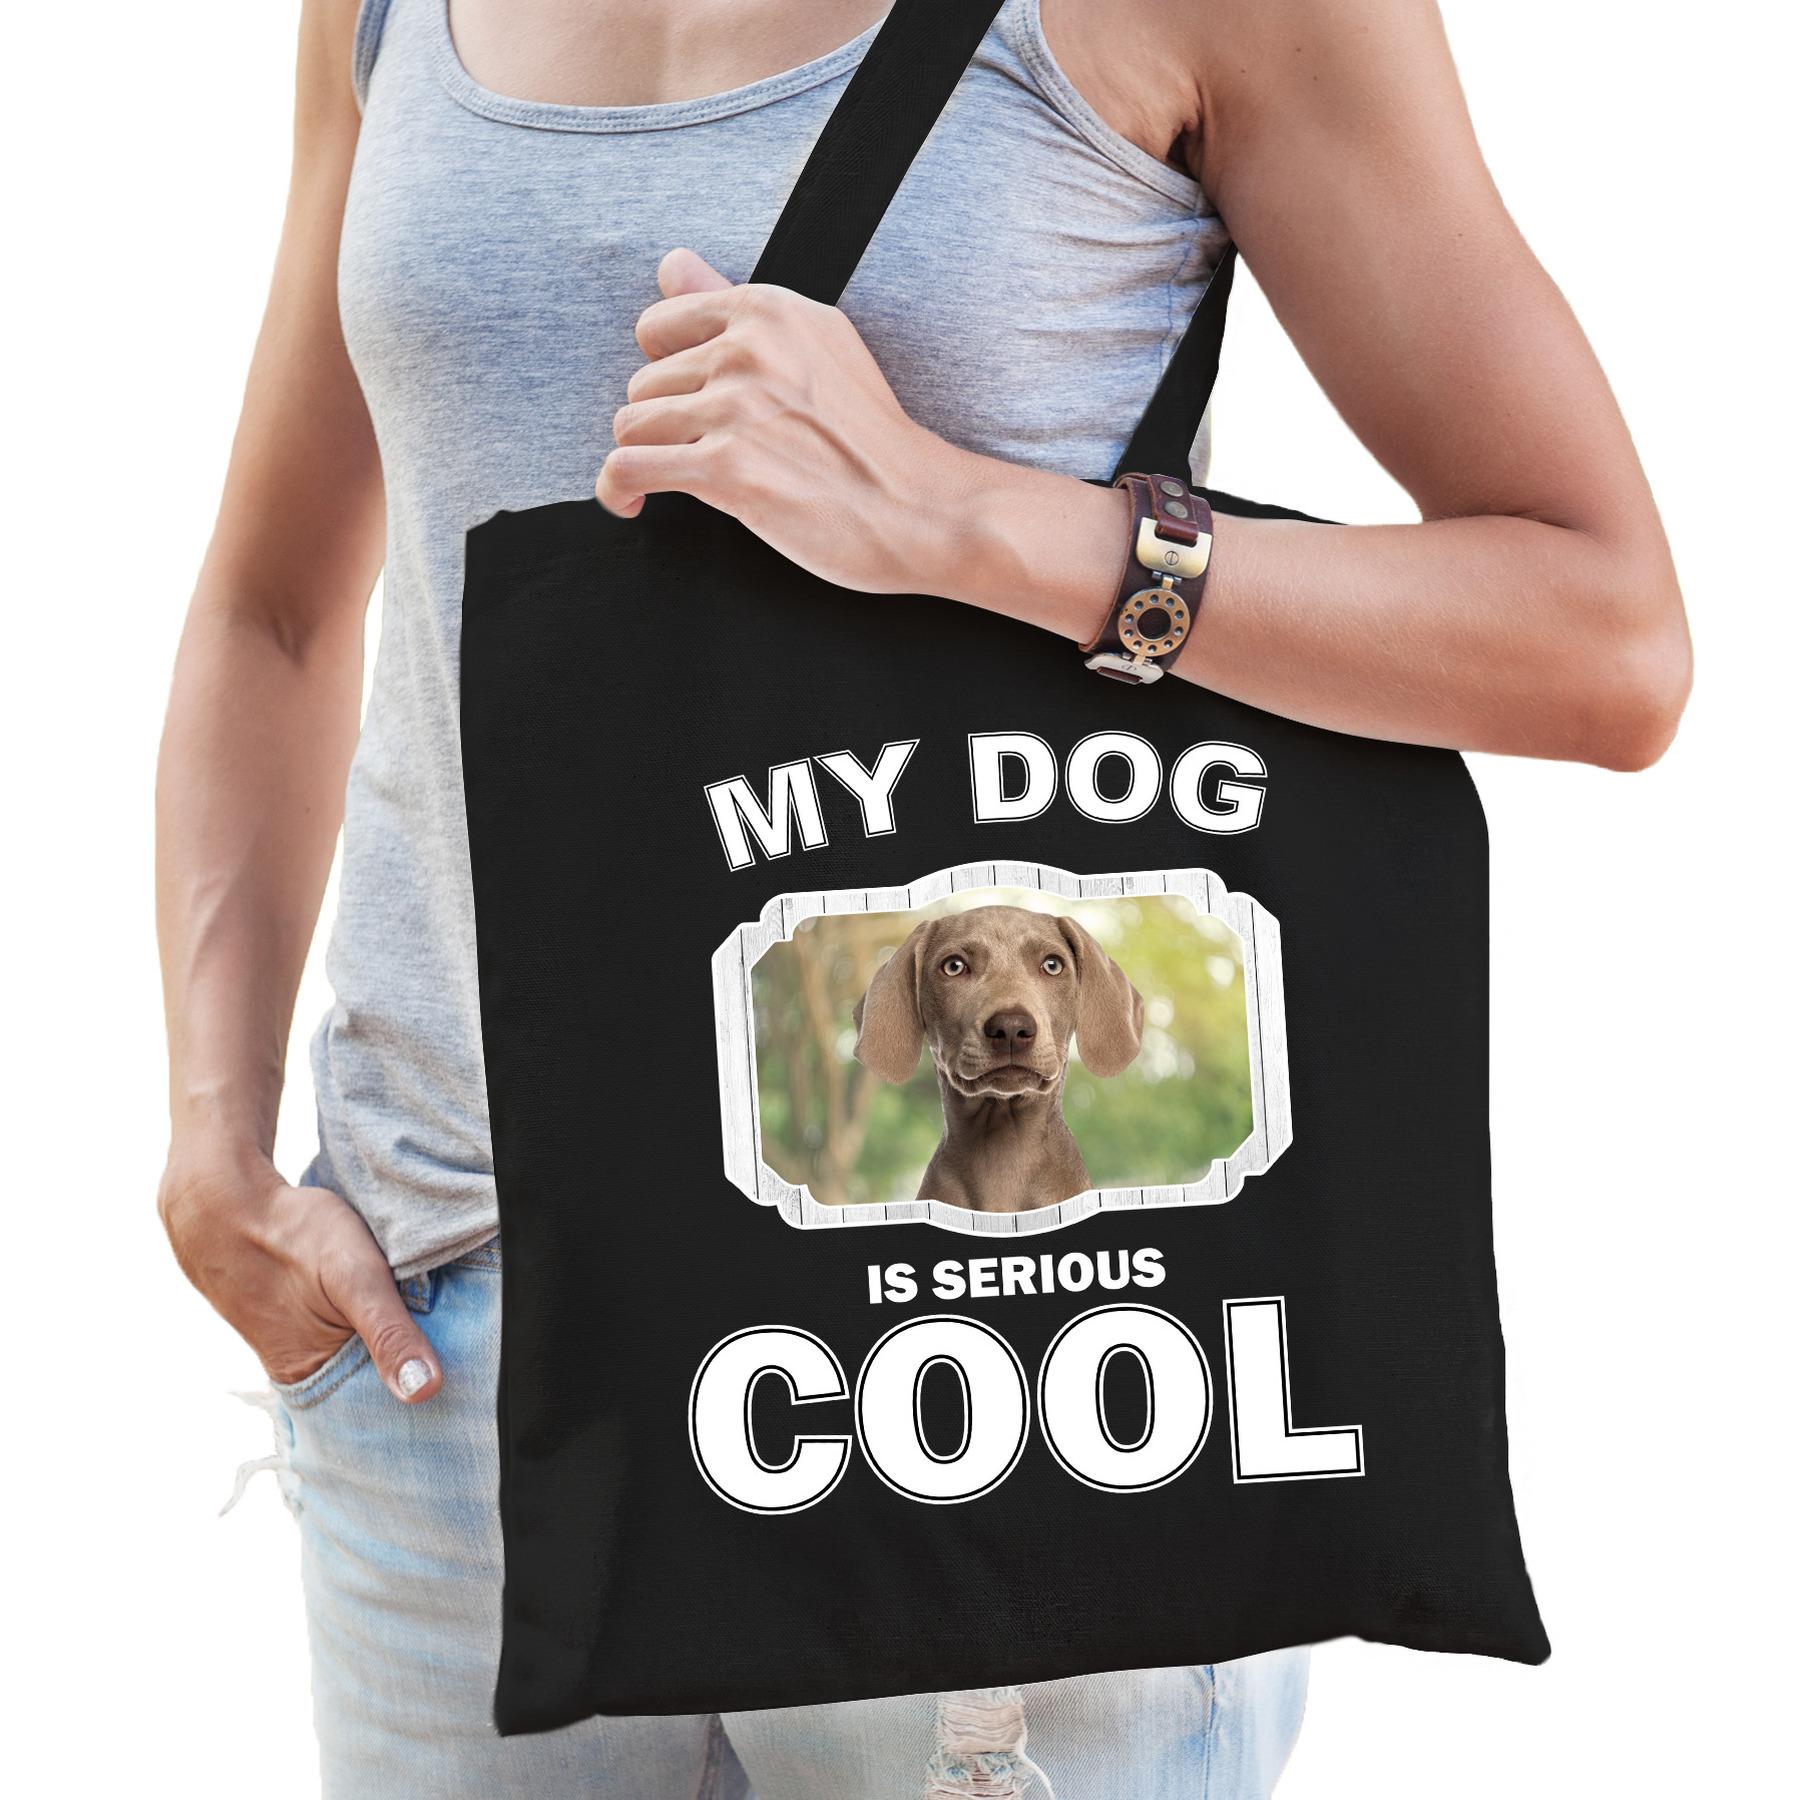 Katoenen tasje my dog is serious cool zwart - Weimaraner honden cadeau tas